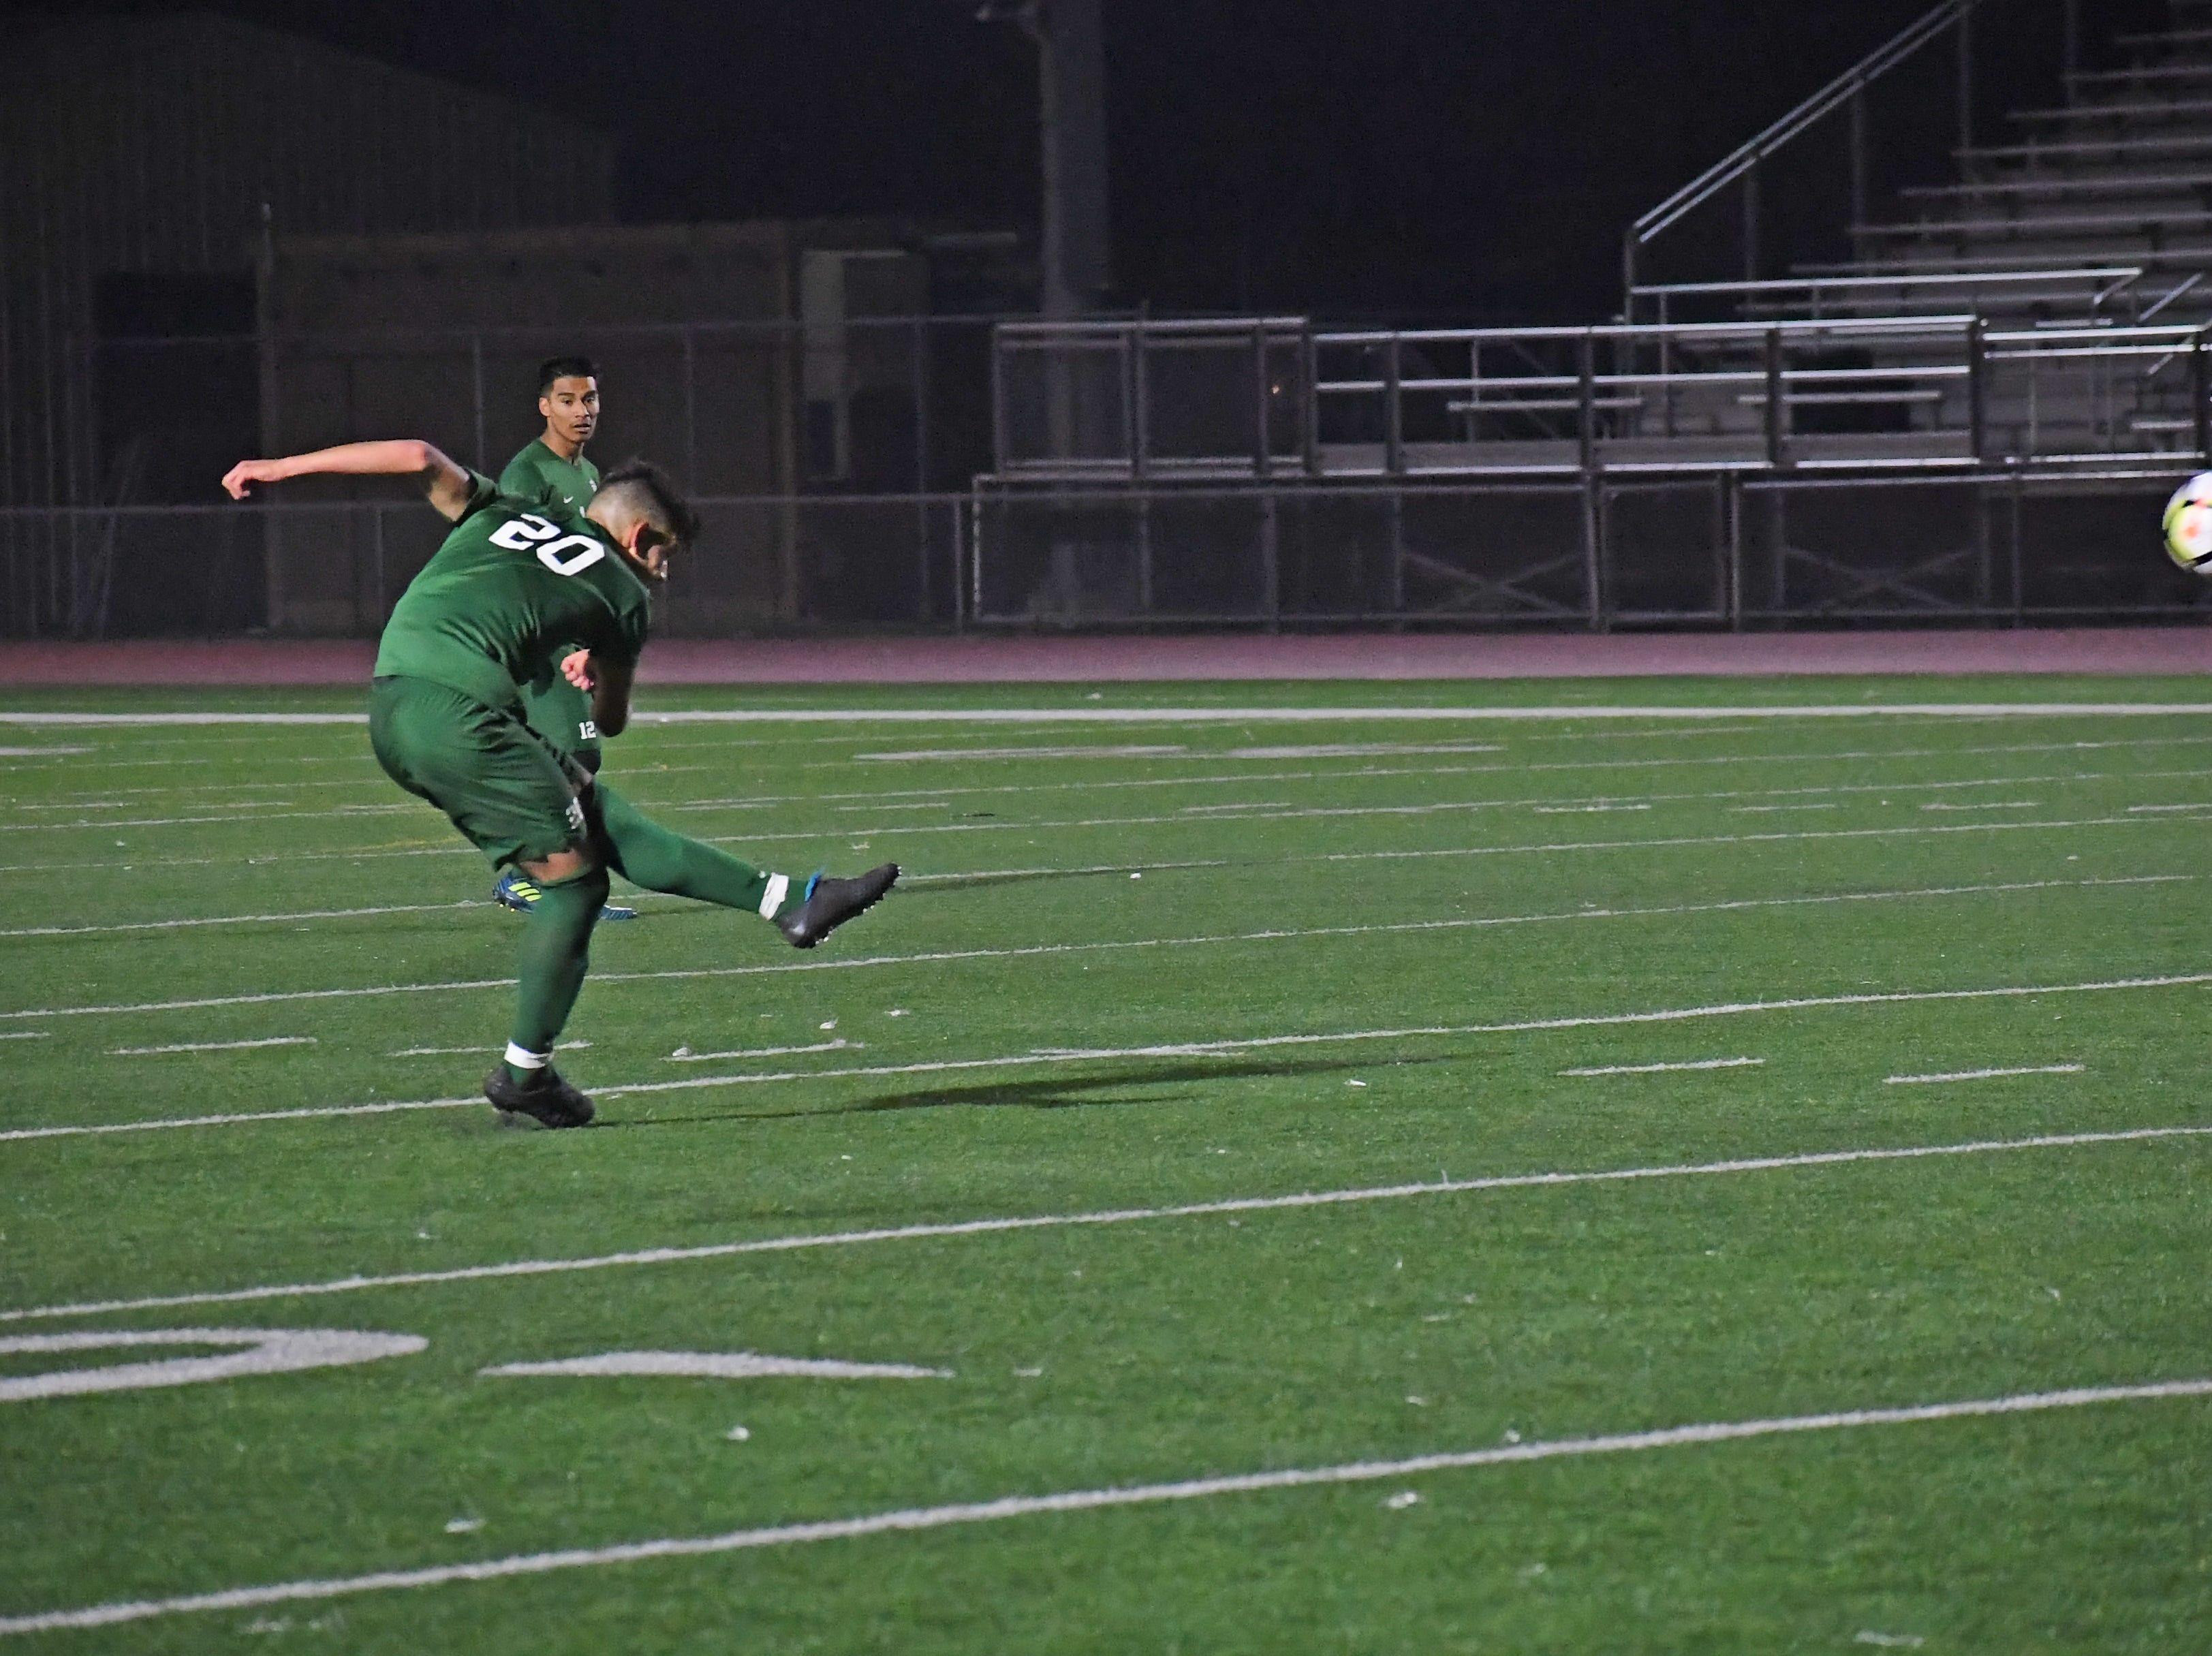 Midfielder Abraham Montaño (20) launches a free kick towards the Bellarmine goal.